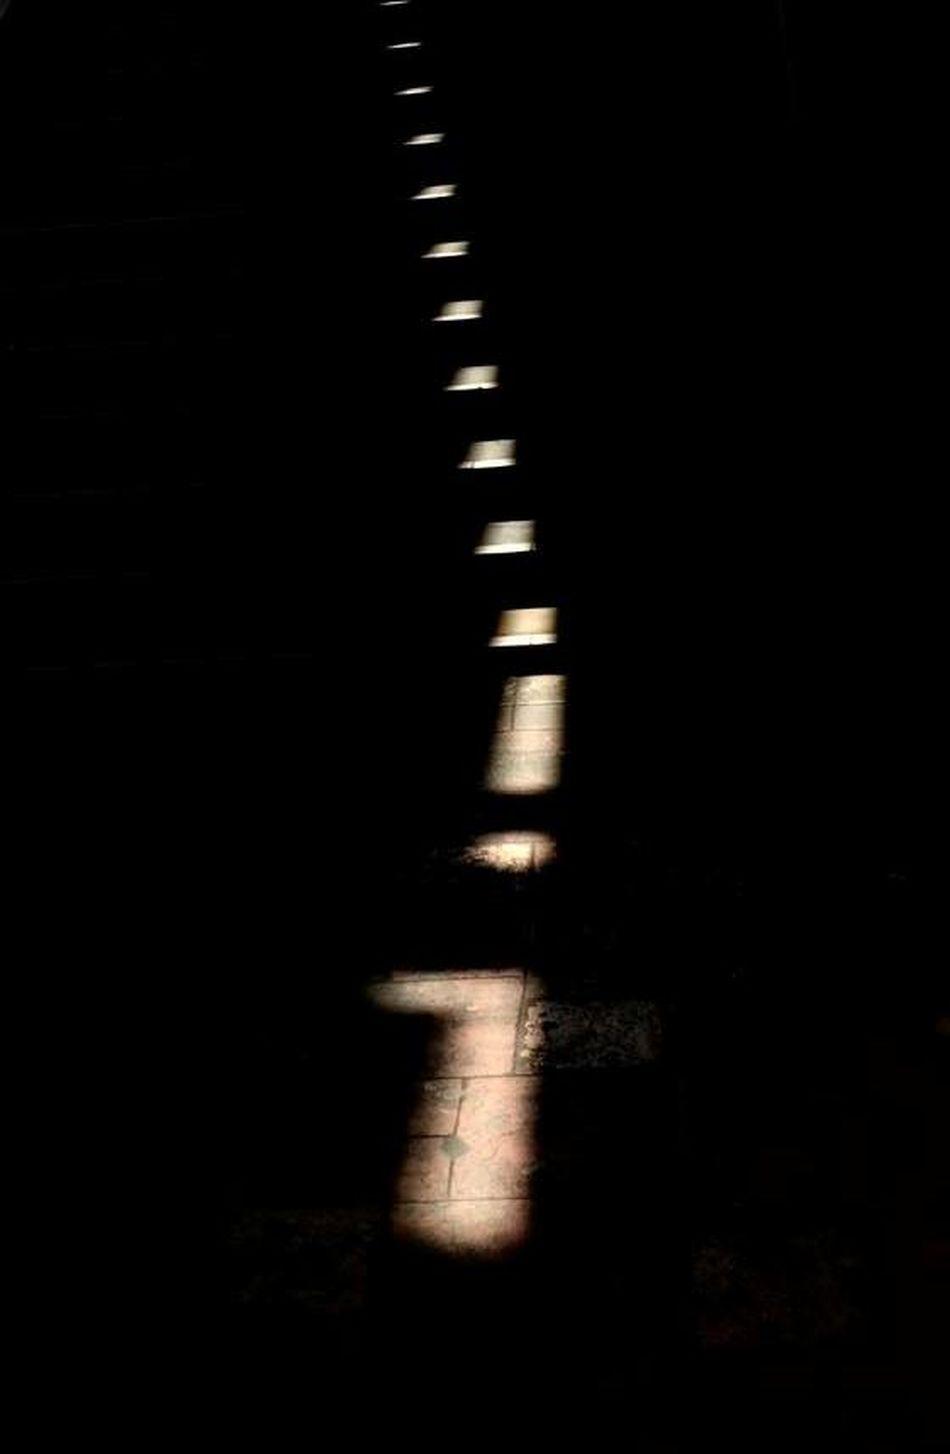 #everydaystreet #EyeemPhilippines #instagood, #tweegram #photooftheday #sketch,#sketchclub,#malen,#painting,#instagram,#picoftheday,#art,#star,#followme,#follow,#pic,#peoples,#aroundtheworld #iphoneasia #instamood #me #iphoneonly #instagramhub #girl #sky #beautiful #love #IPhone5s #Iphoneography #manila #Shadow #streetphotography